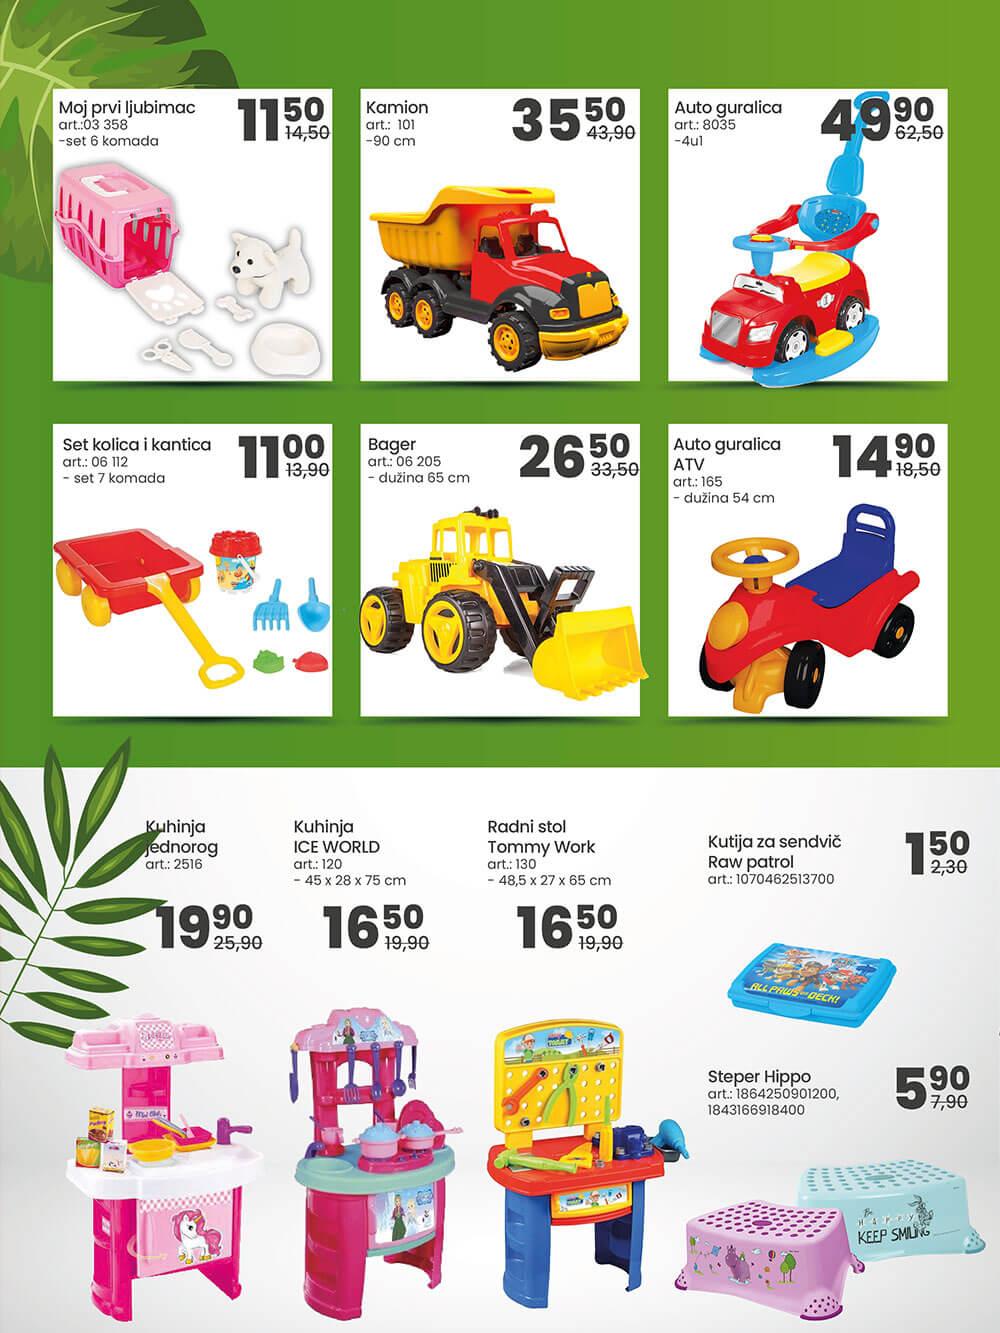 FIS Akcijski Katalog JUN 2021 eKatalozi.com 04.06. 23.06. 12